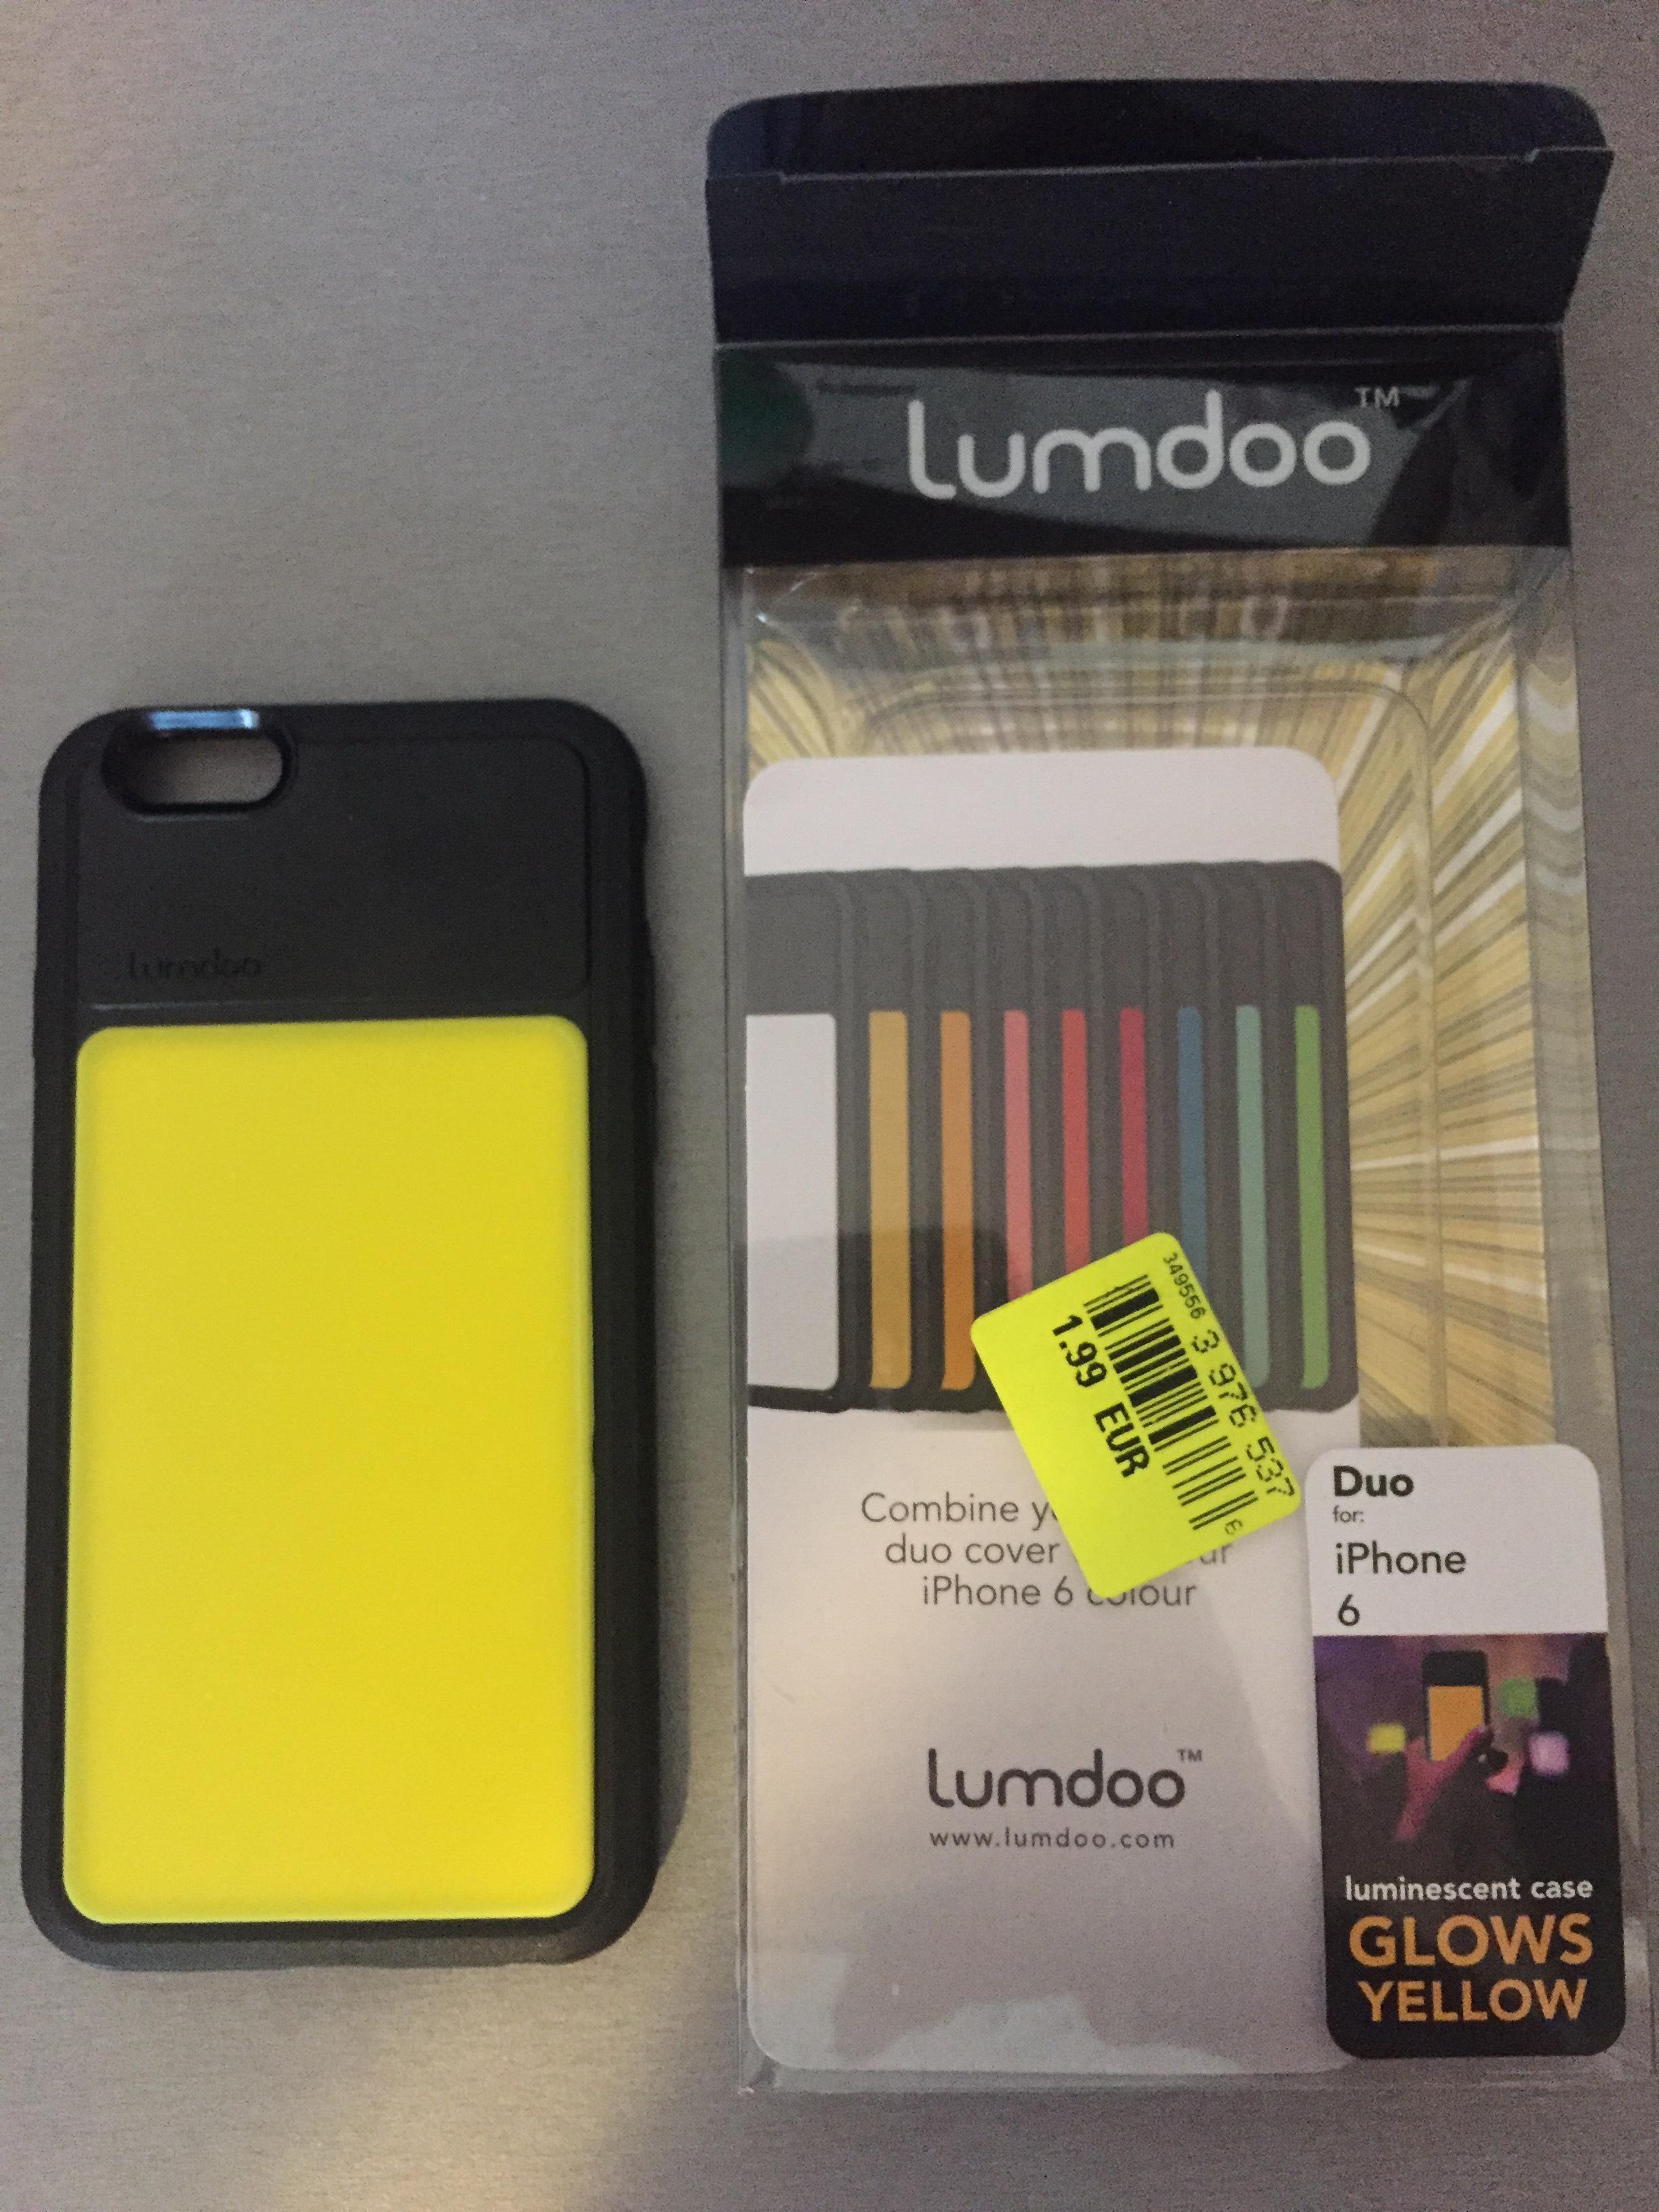 Coque Lumdoo pour Smartphone iPhone 6 / 6S